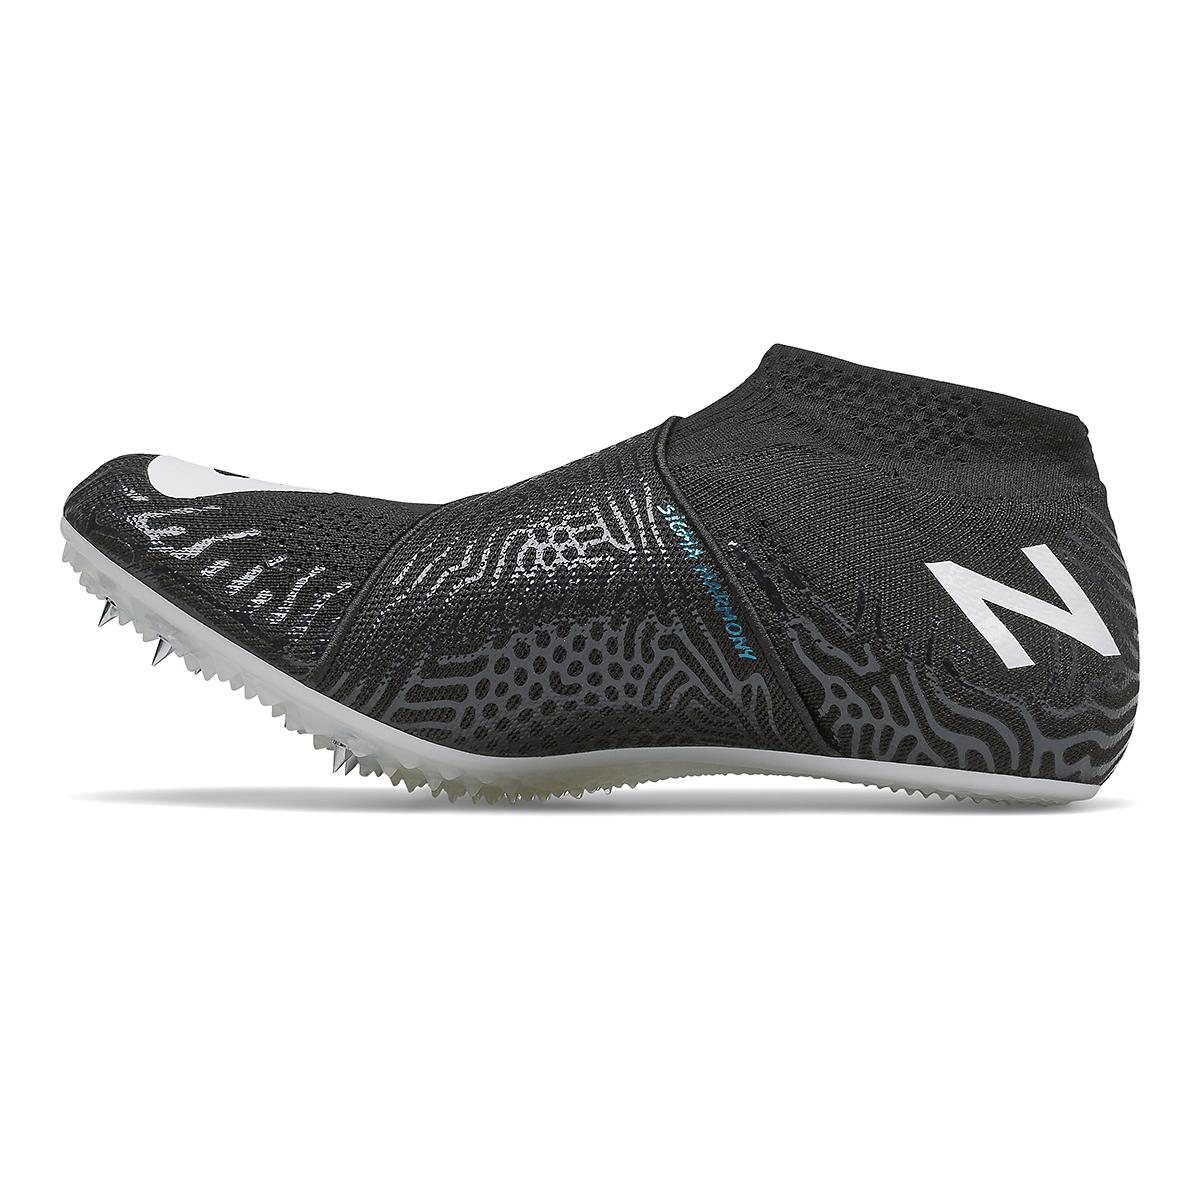 Men's New Balance Sigma Harmony V2 Track Spikes - Color: Black/White - Size: 4.5 - Width: Regular, Black/White, large, image 2